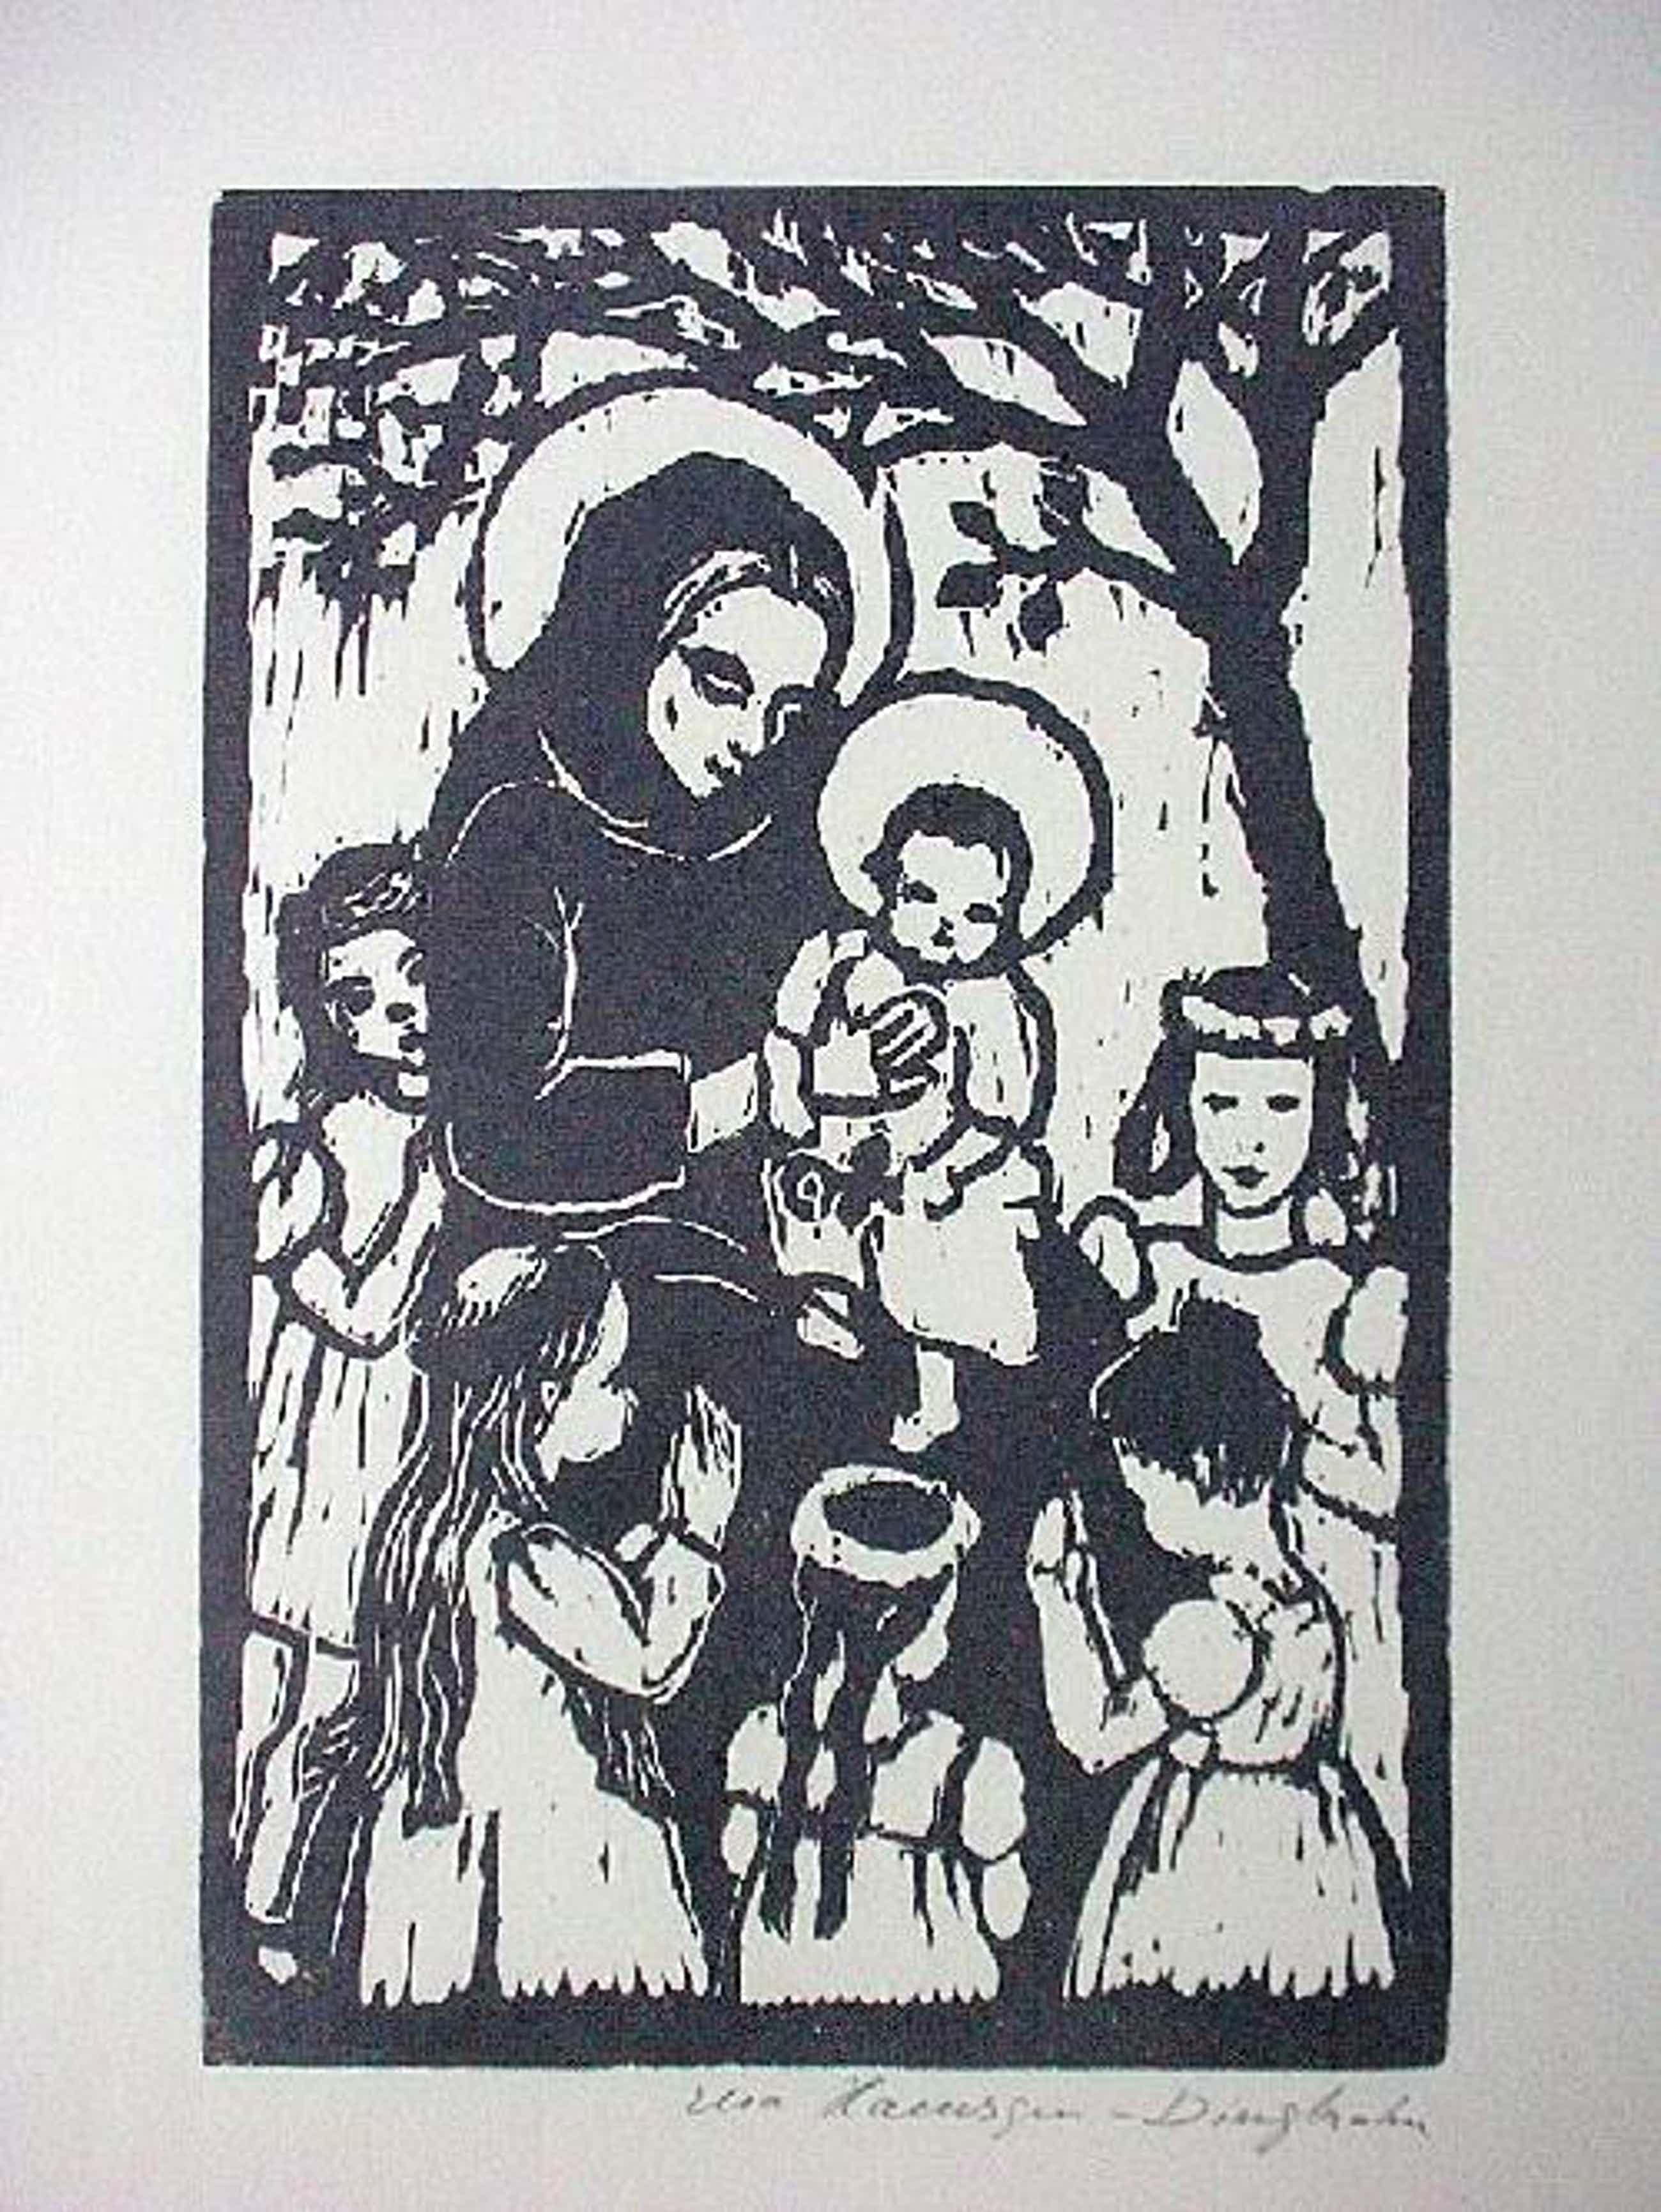 Elsa Haensgen-Dingkuhn - Orig. Holzschnitt 1952, Maria mit Kind, signiert kopen? Bied vanaf 70!